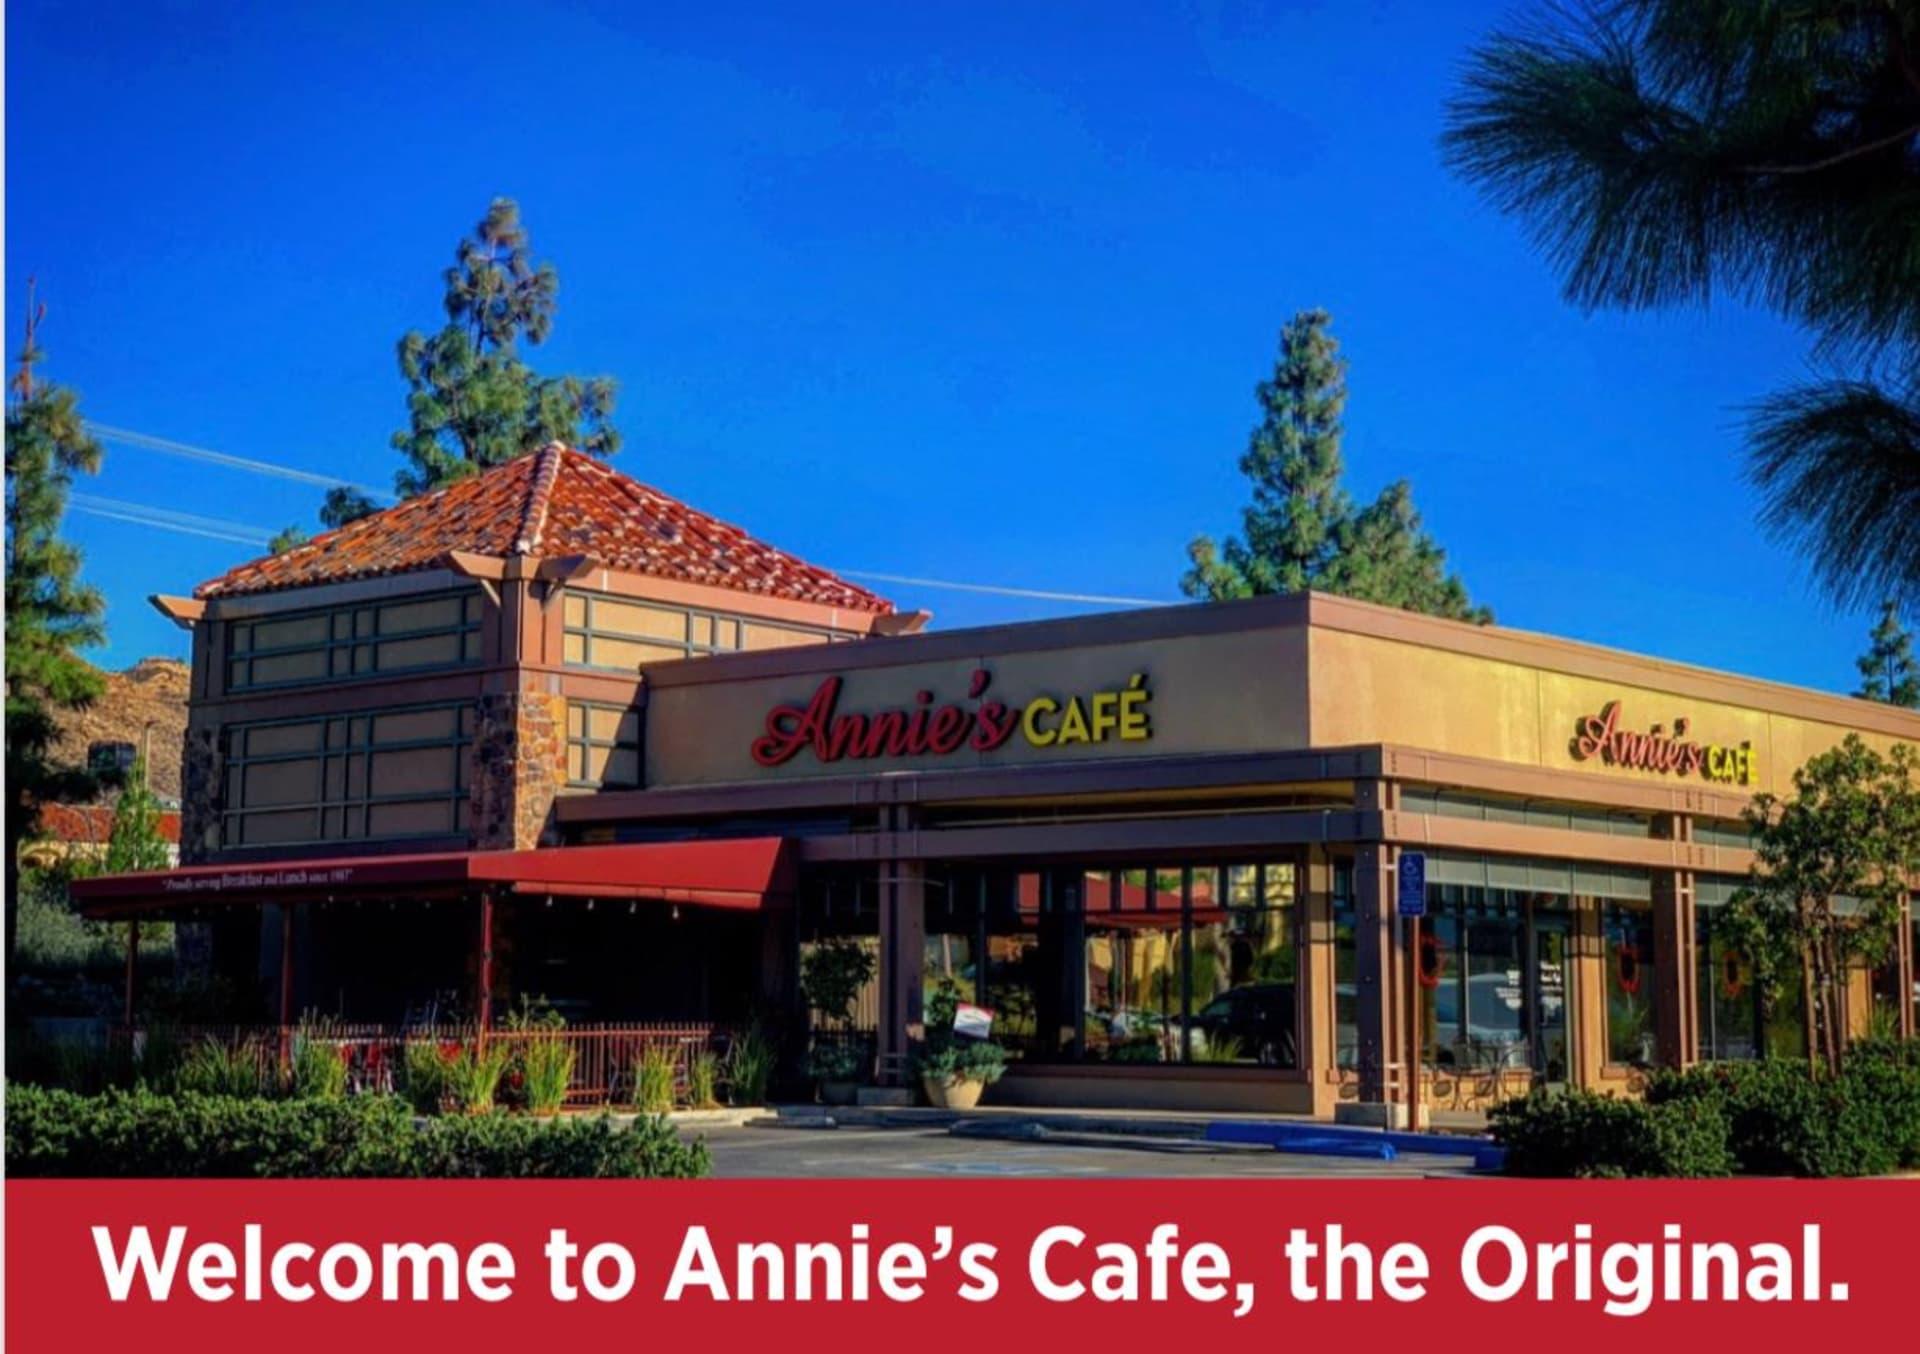 Fun Times - a little taste of Annie's Cafe